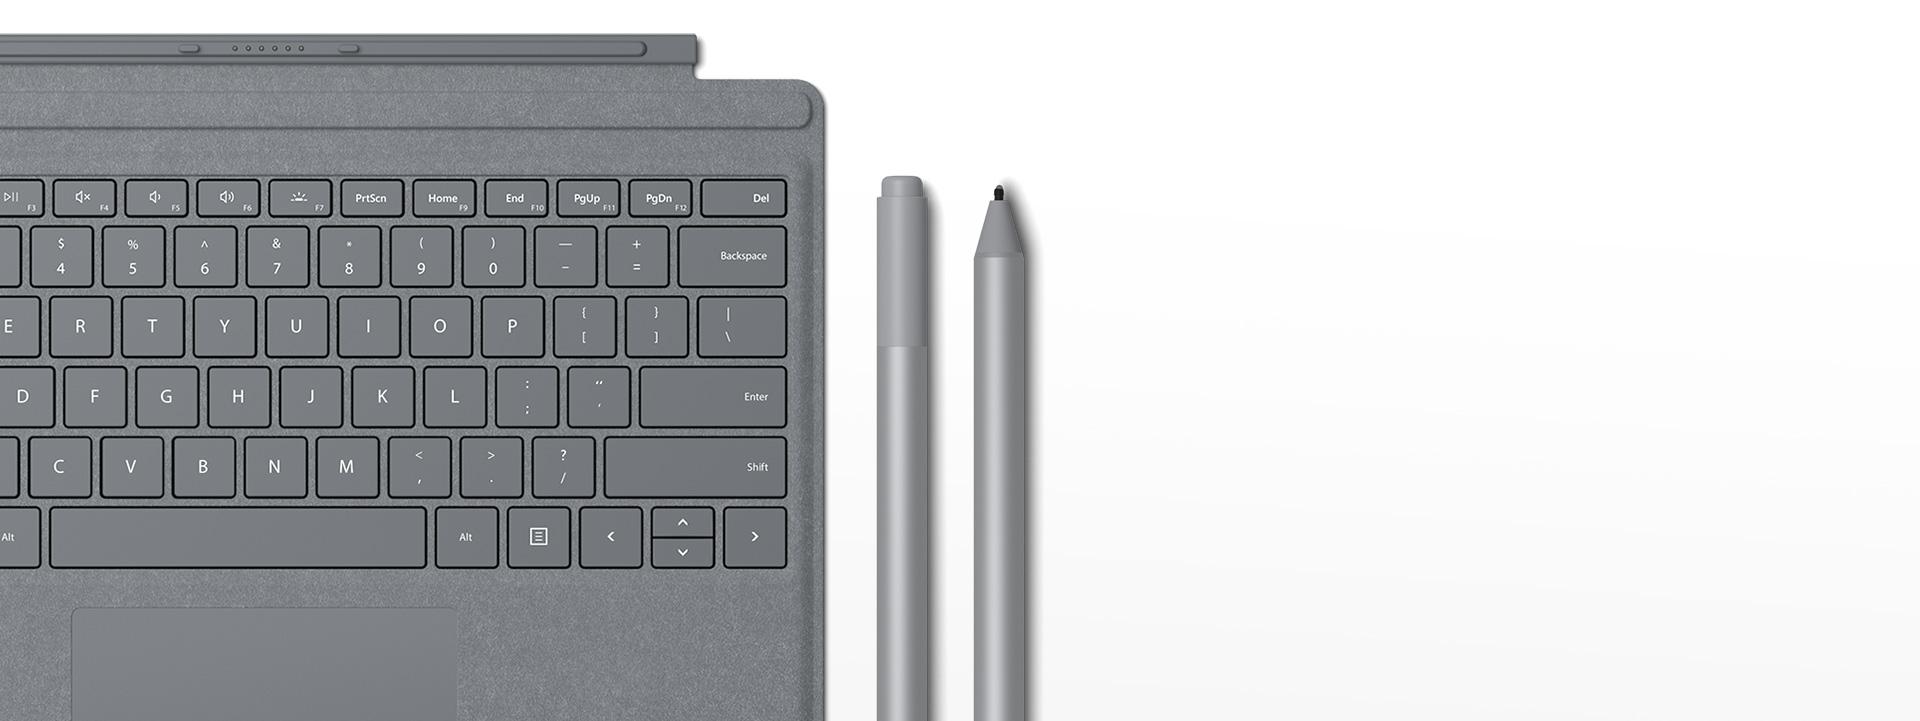 Surface Pro Signature 中文版/专业版专业键盘盖、Surface 触控笔